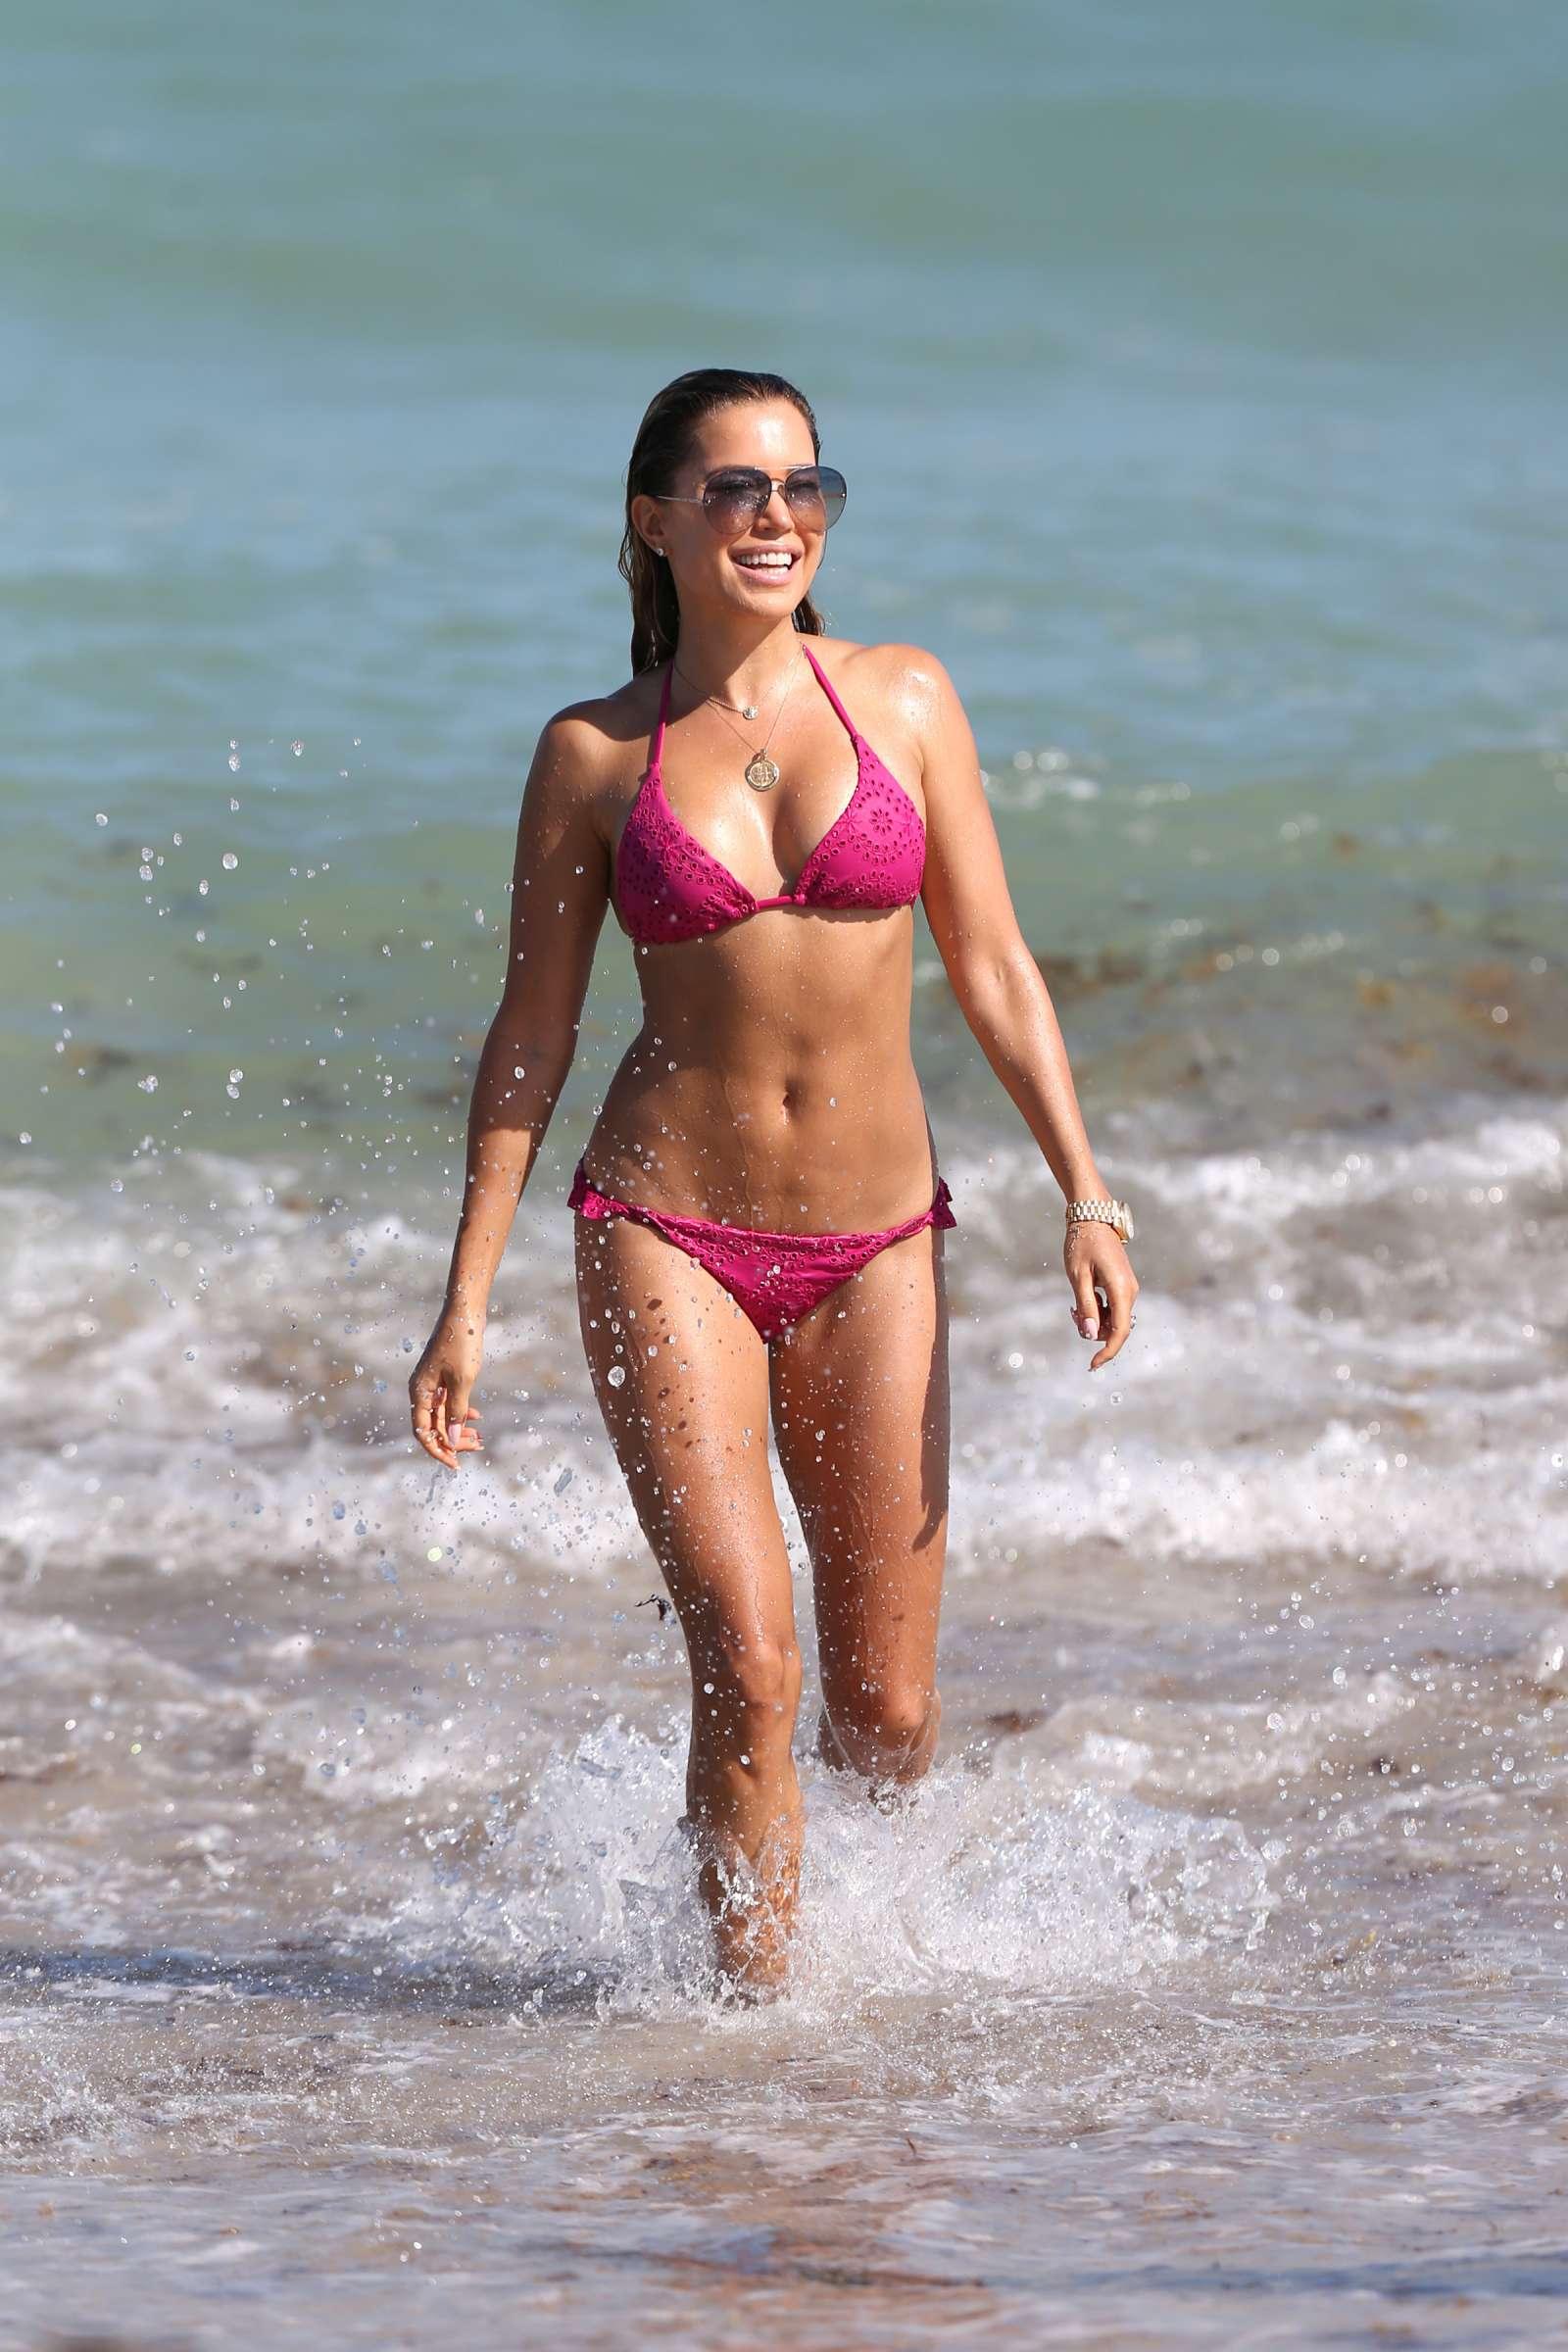 Sylvie Meis 2018 : Sylvie Meis in Pink Bikini 2018 -09